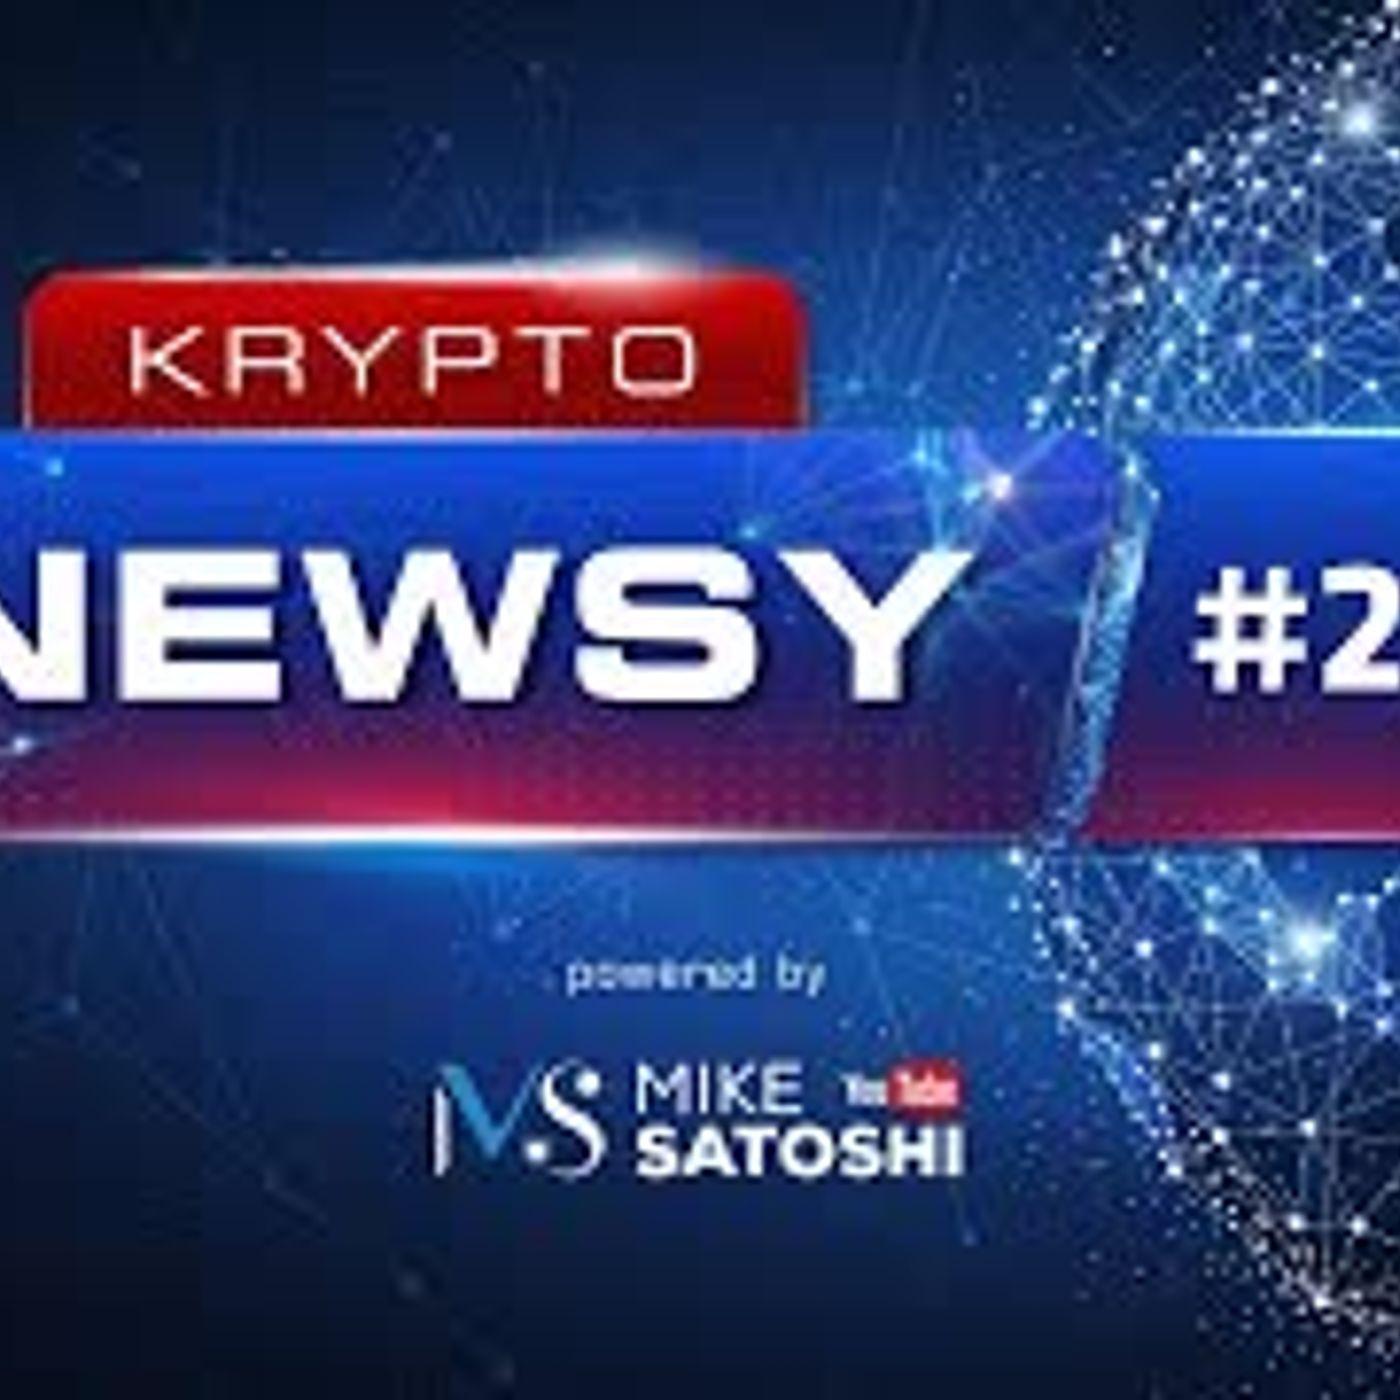 Krypto-Newsy #216 | 16.05.2020 | Bitcoin może łatwo osiągnąć $500k, Bithumb usuwa Monero, Uphold i XRP Tip Bot